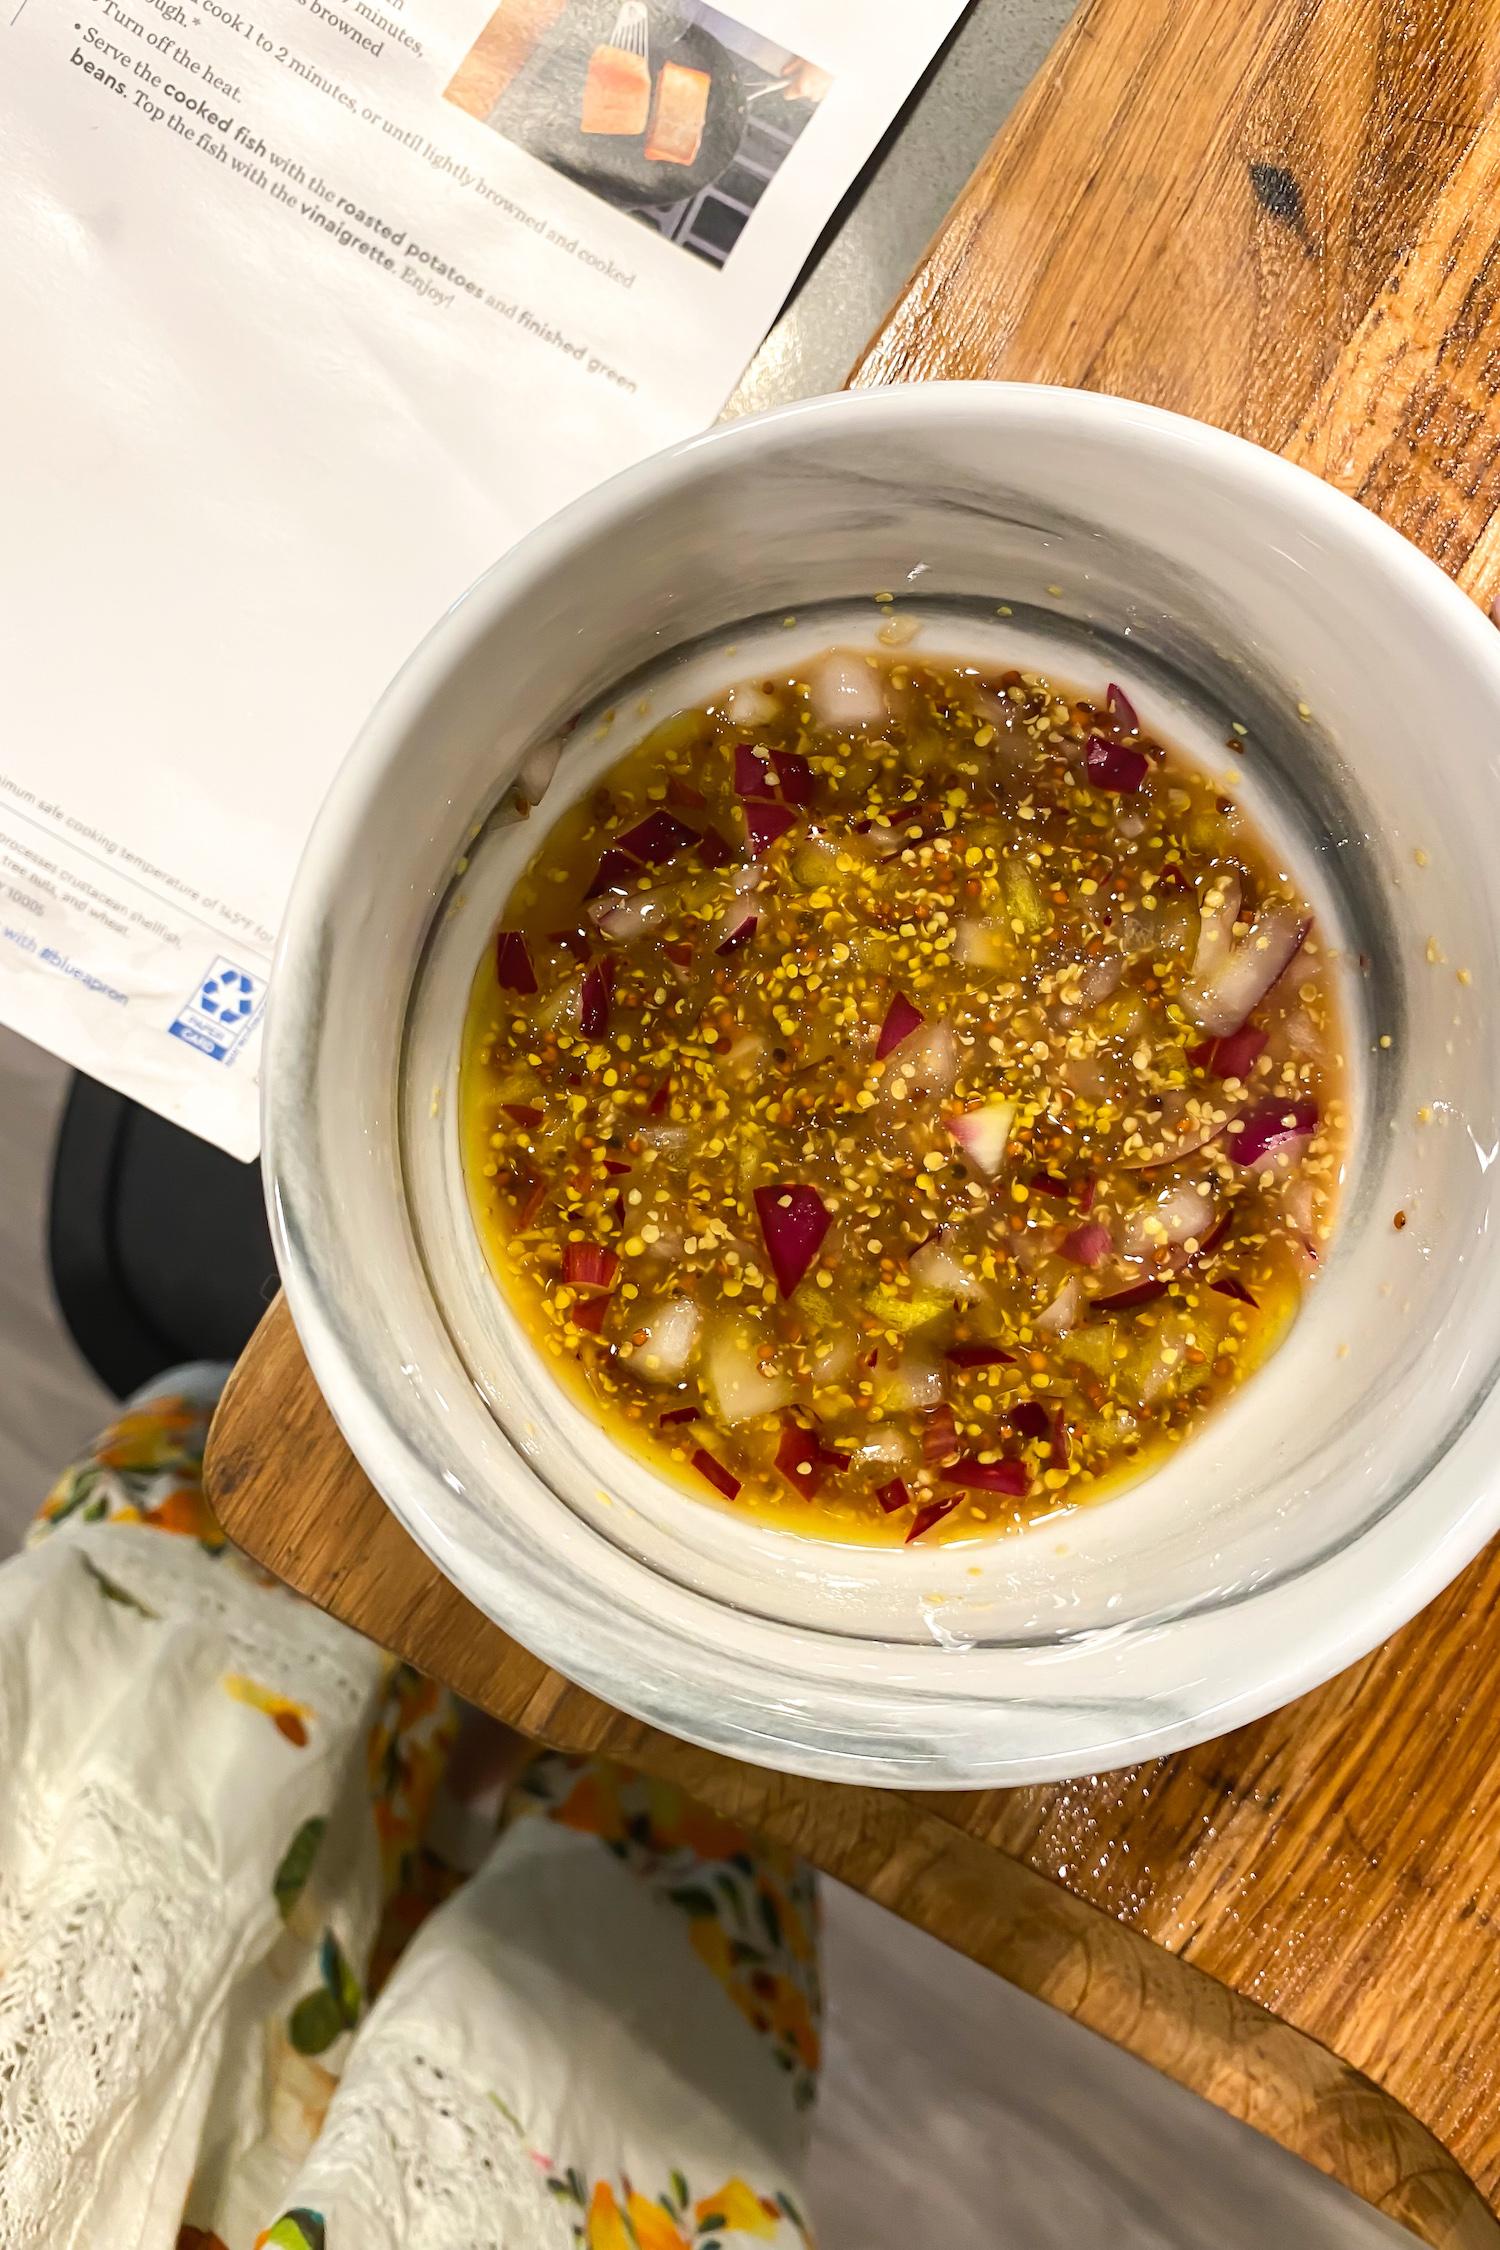 How to make Seared Trout & Onion Dijon Vinaigrette